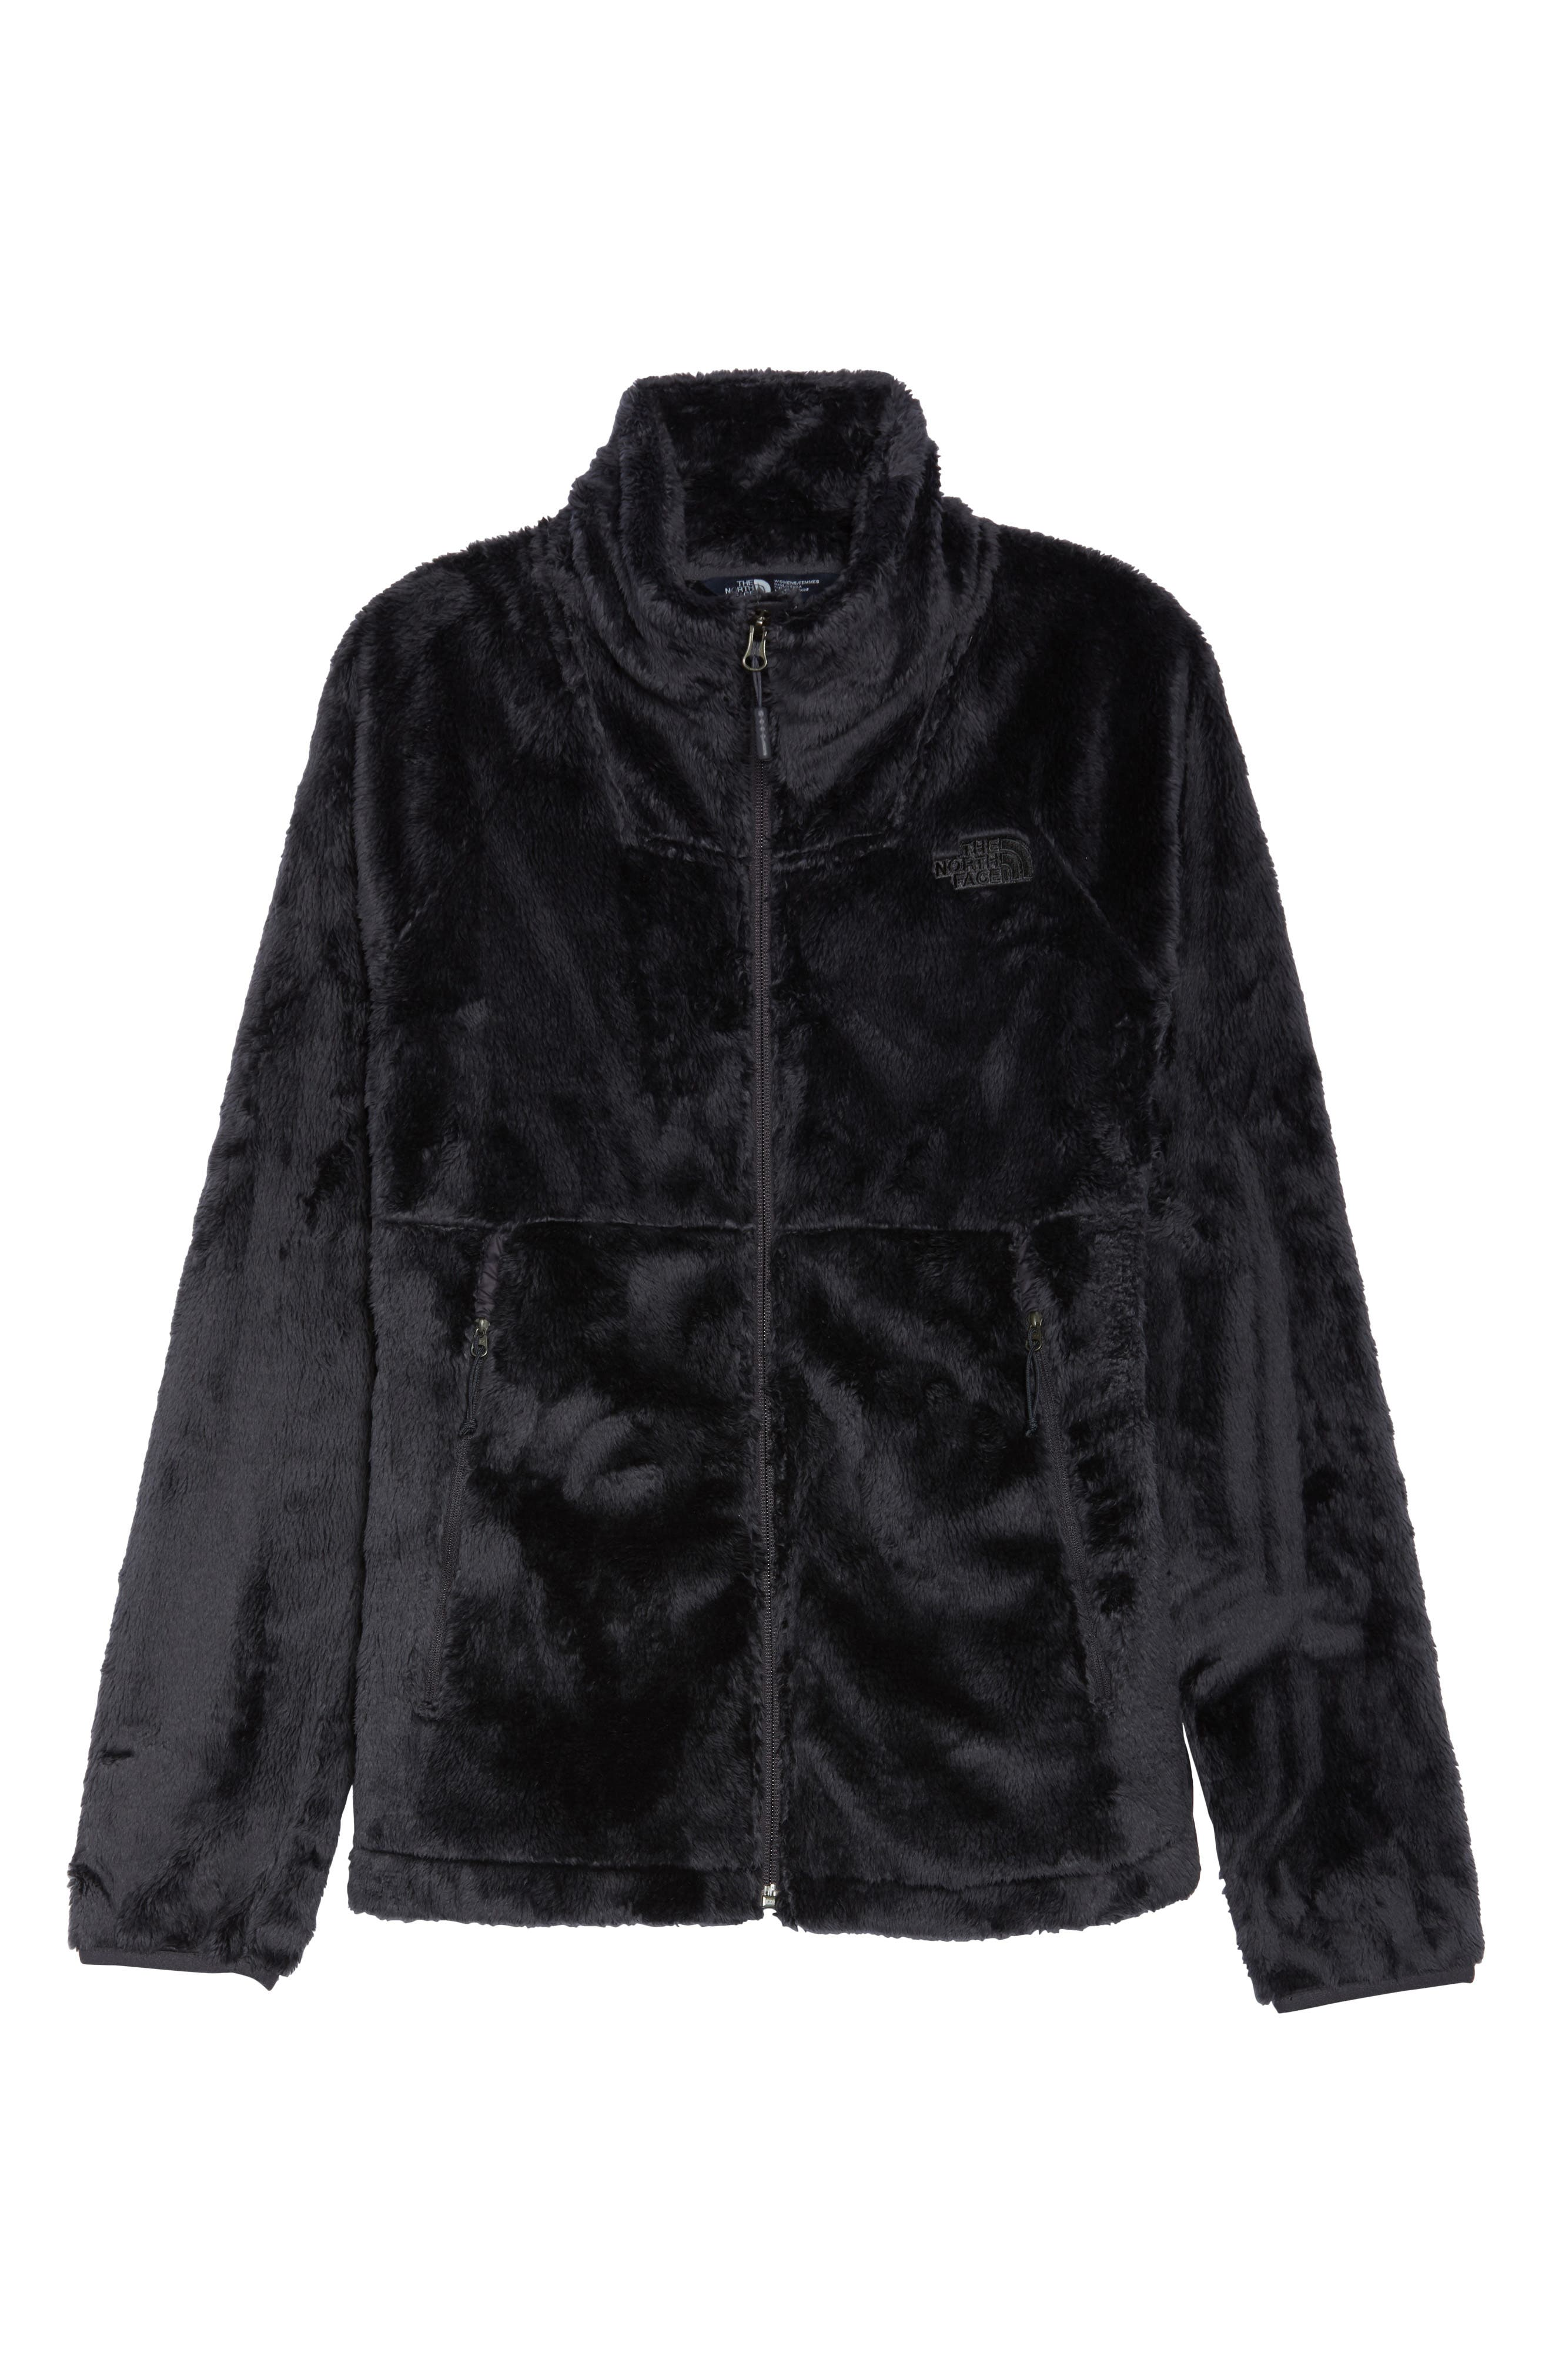 Osito Sport Hybrid Jacket,                             Alternate thumbnail 6, color,                             WEATHERED BLACK